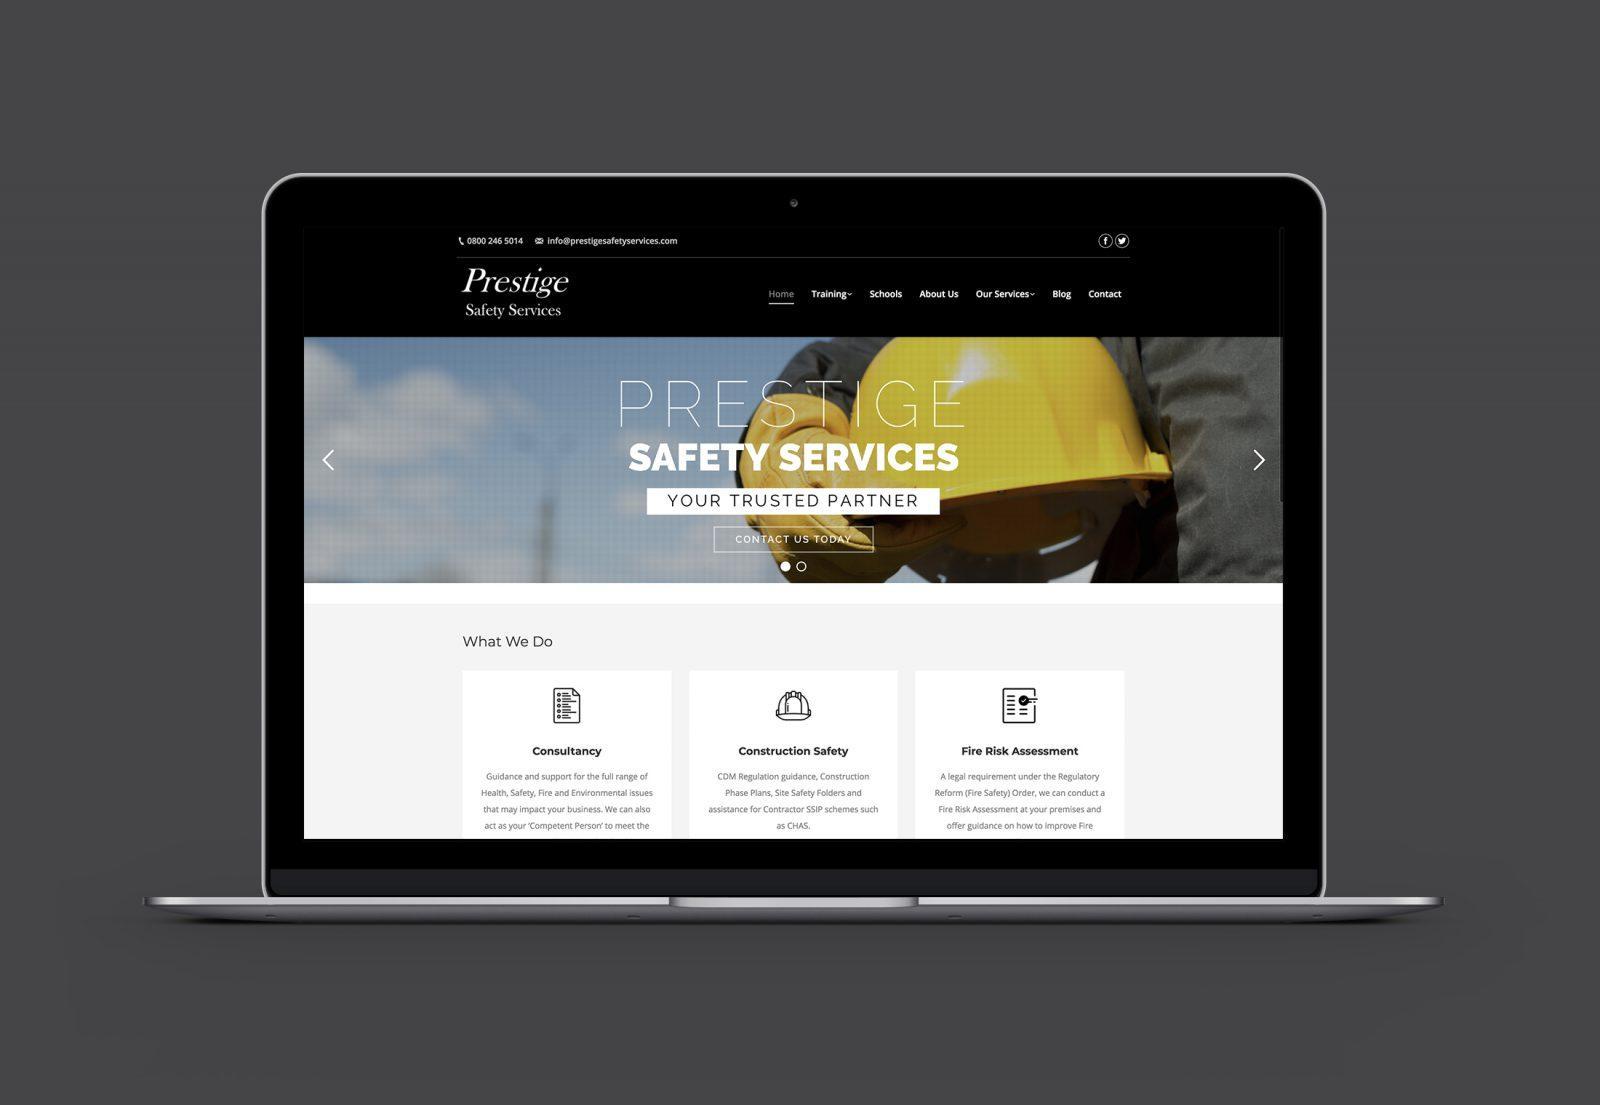 Prestige Safety Services Homepage